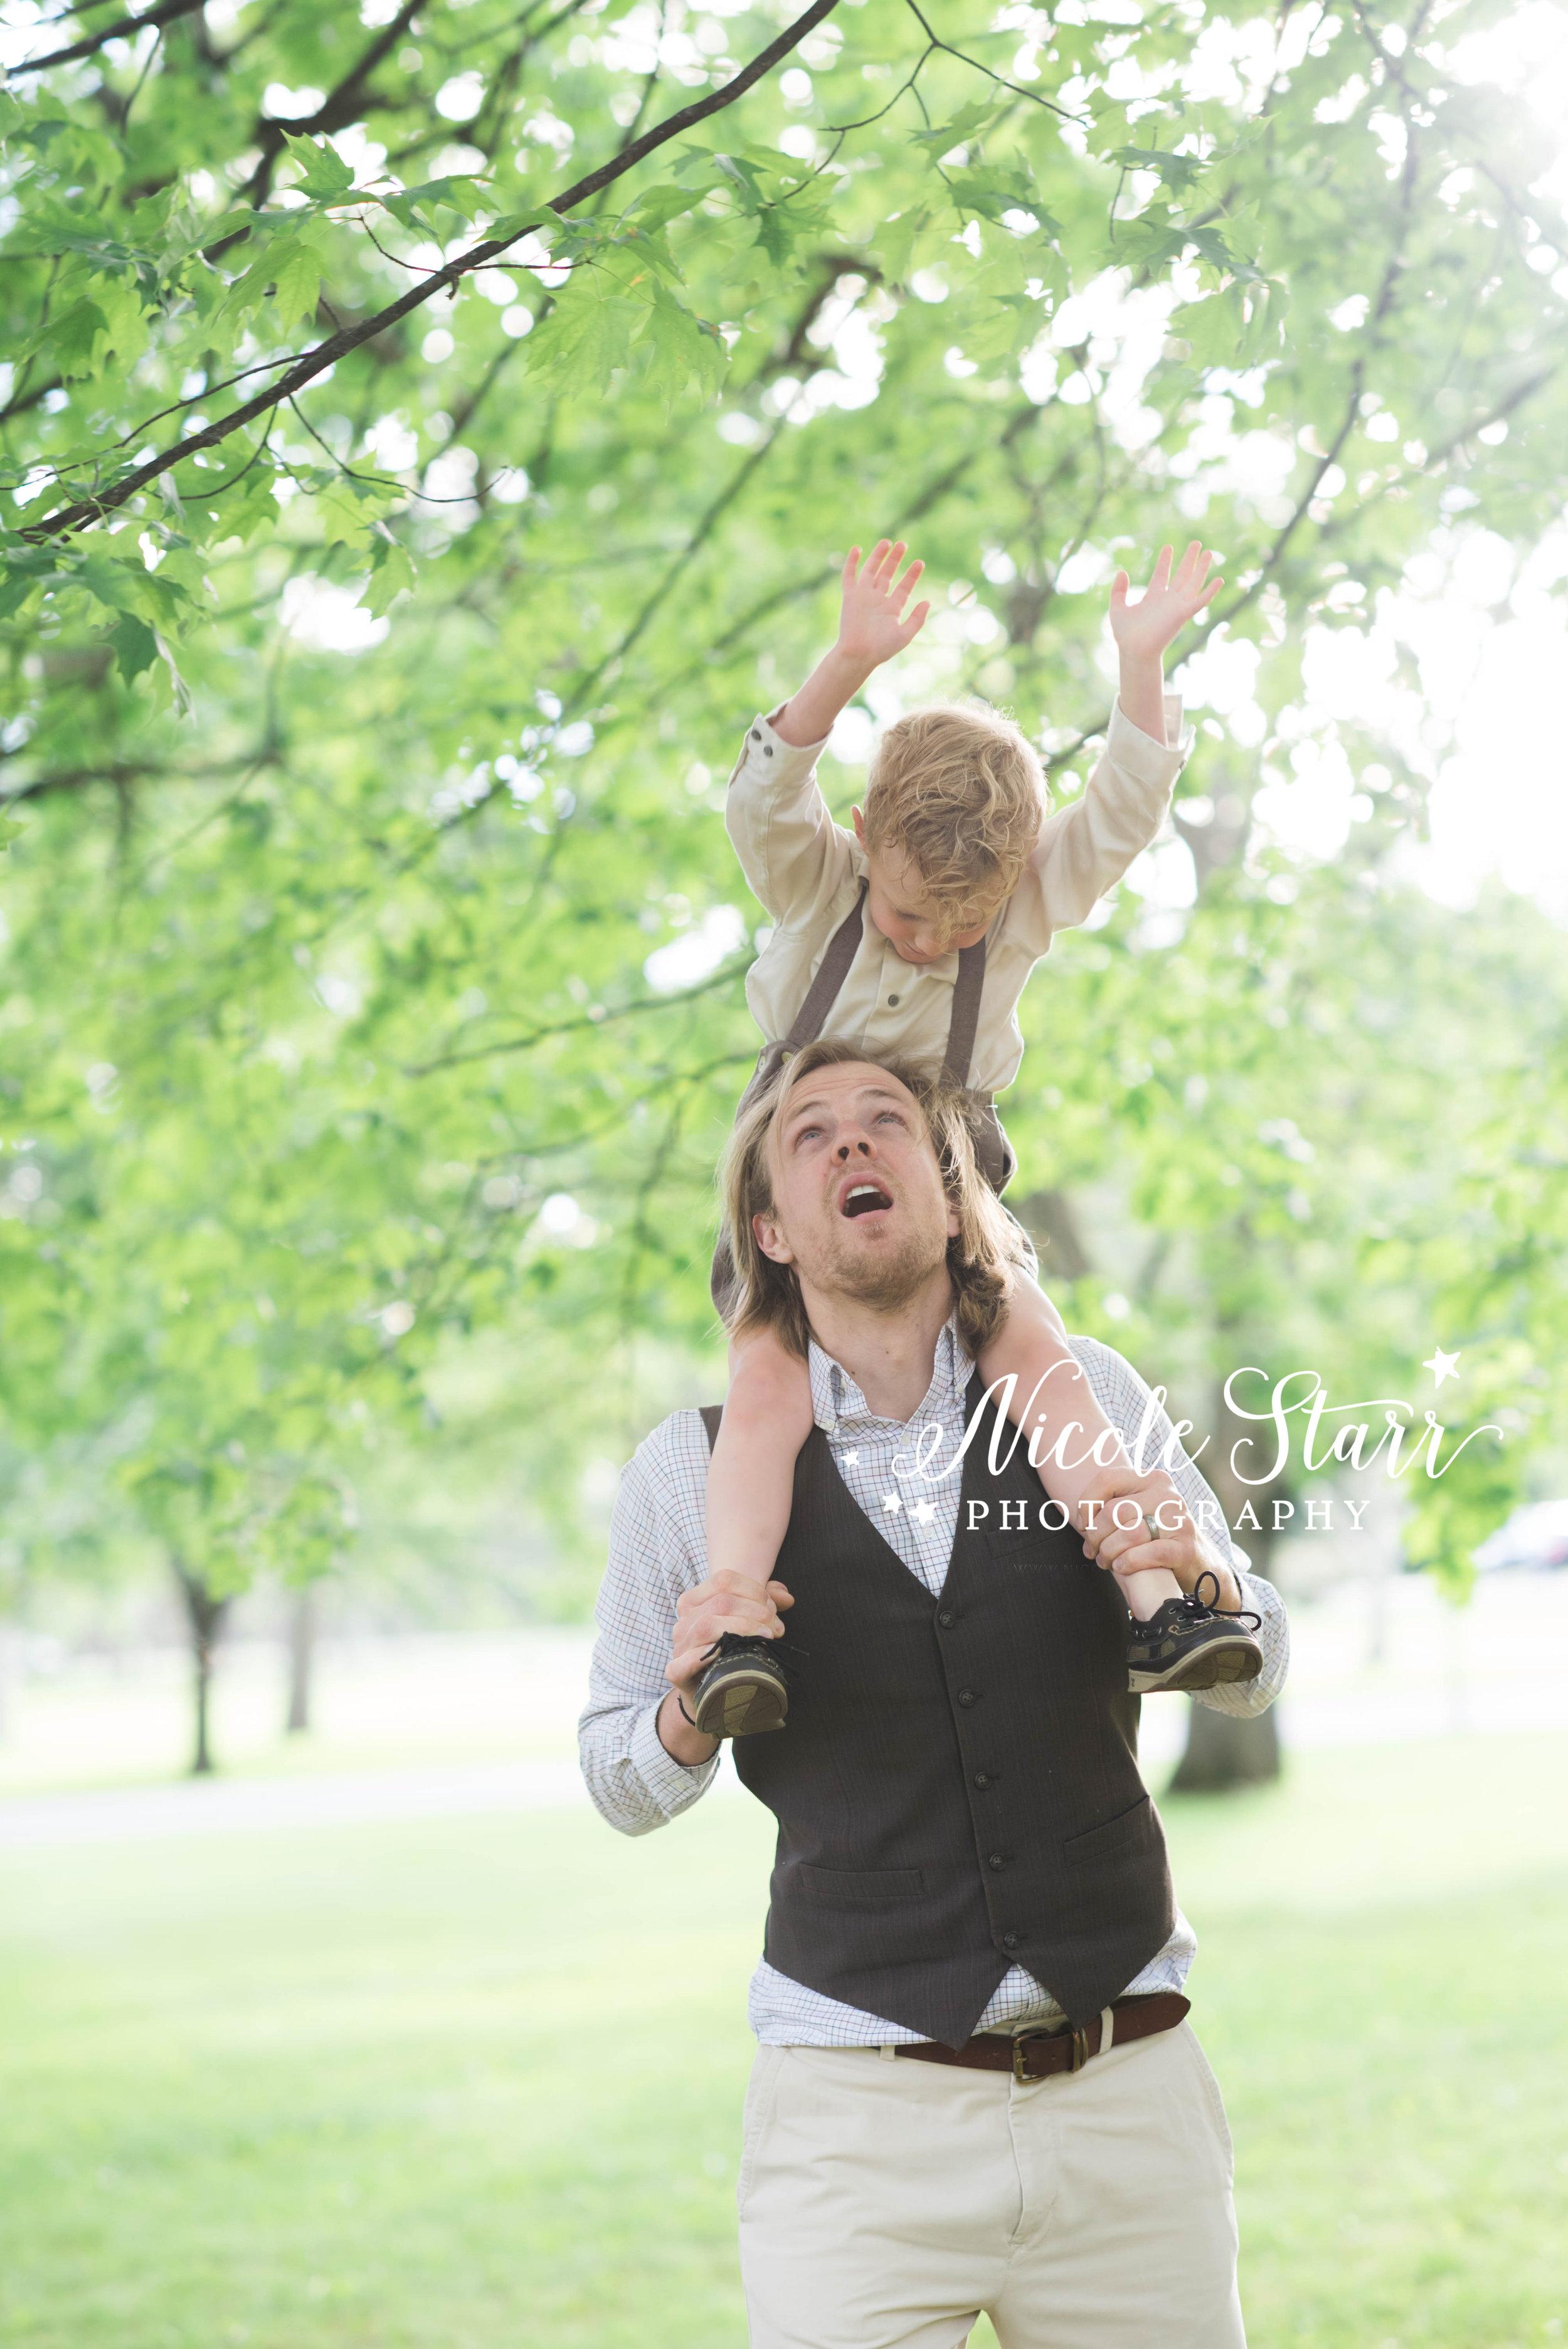 Nicole Starr Photography | Saratoga Springs Family Photographer | Boston Family Photographer | Upstate NY Family Photographer | Family Photographer